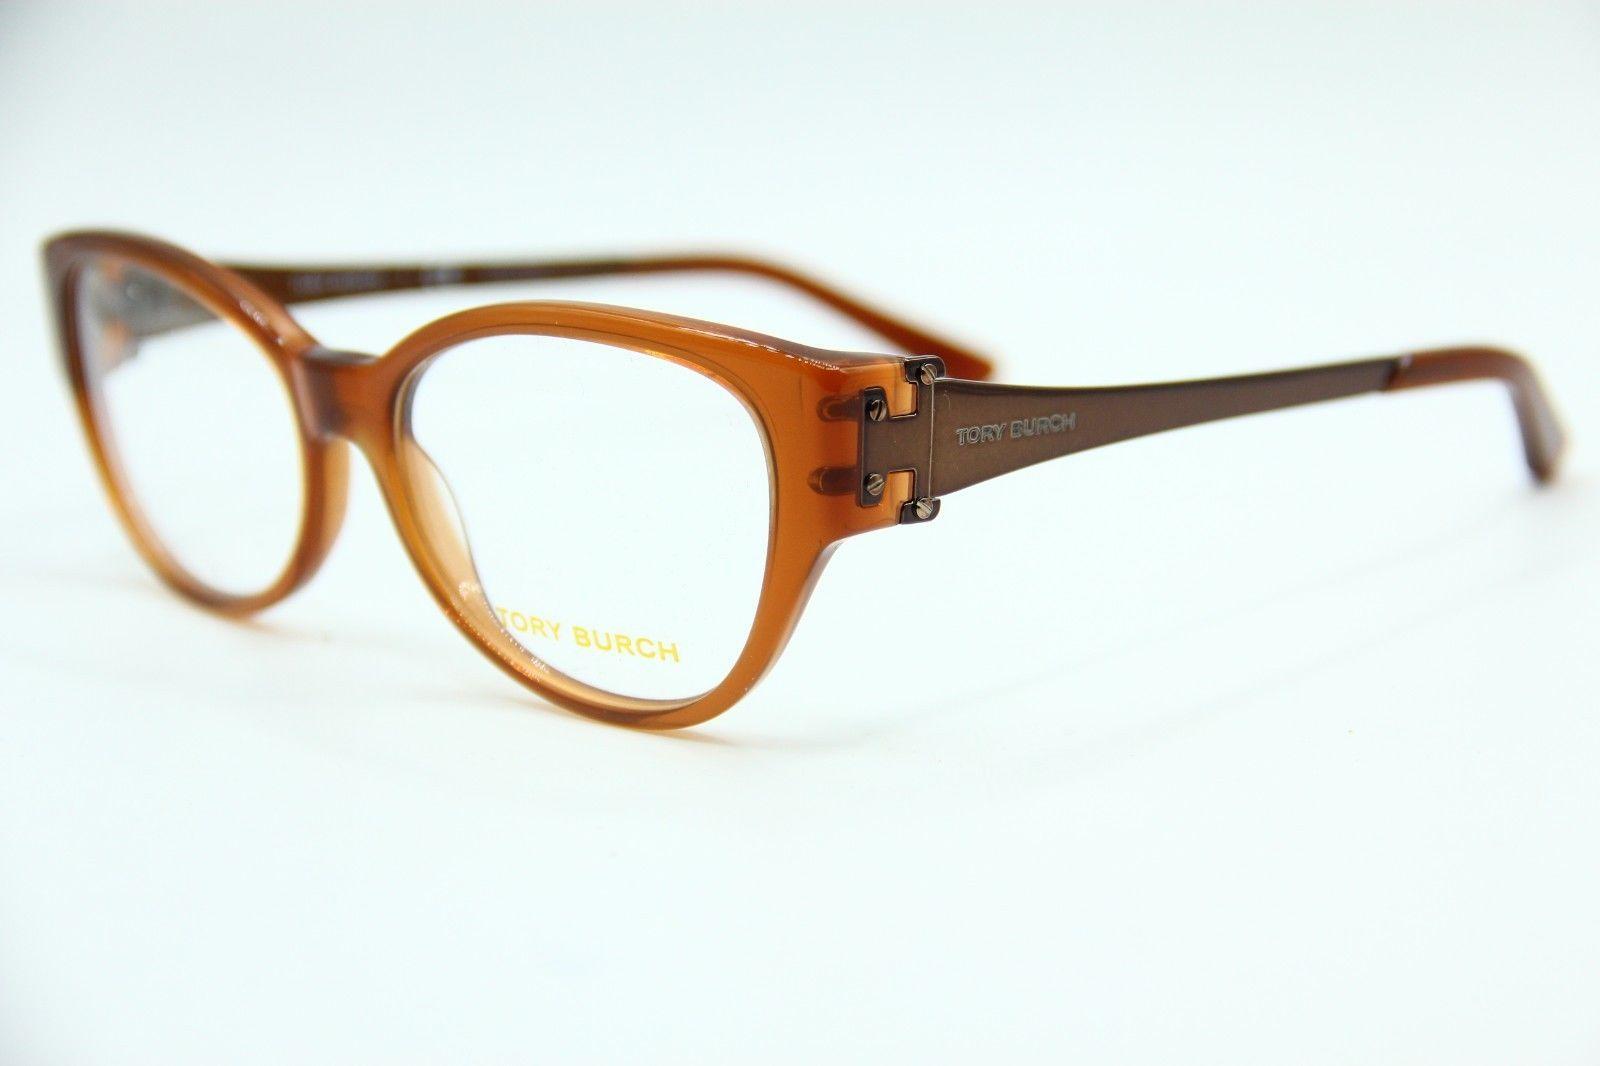 c5fcef8b8c4d New Tory Burch Ty 2077 1678 Brown Eyeglasses and 30 similar items